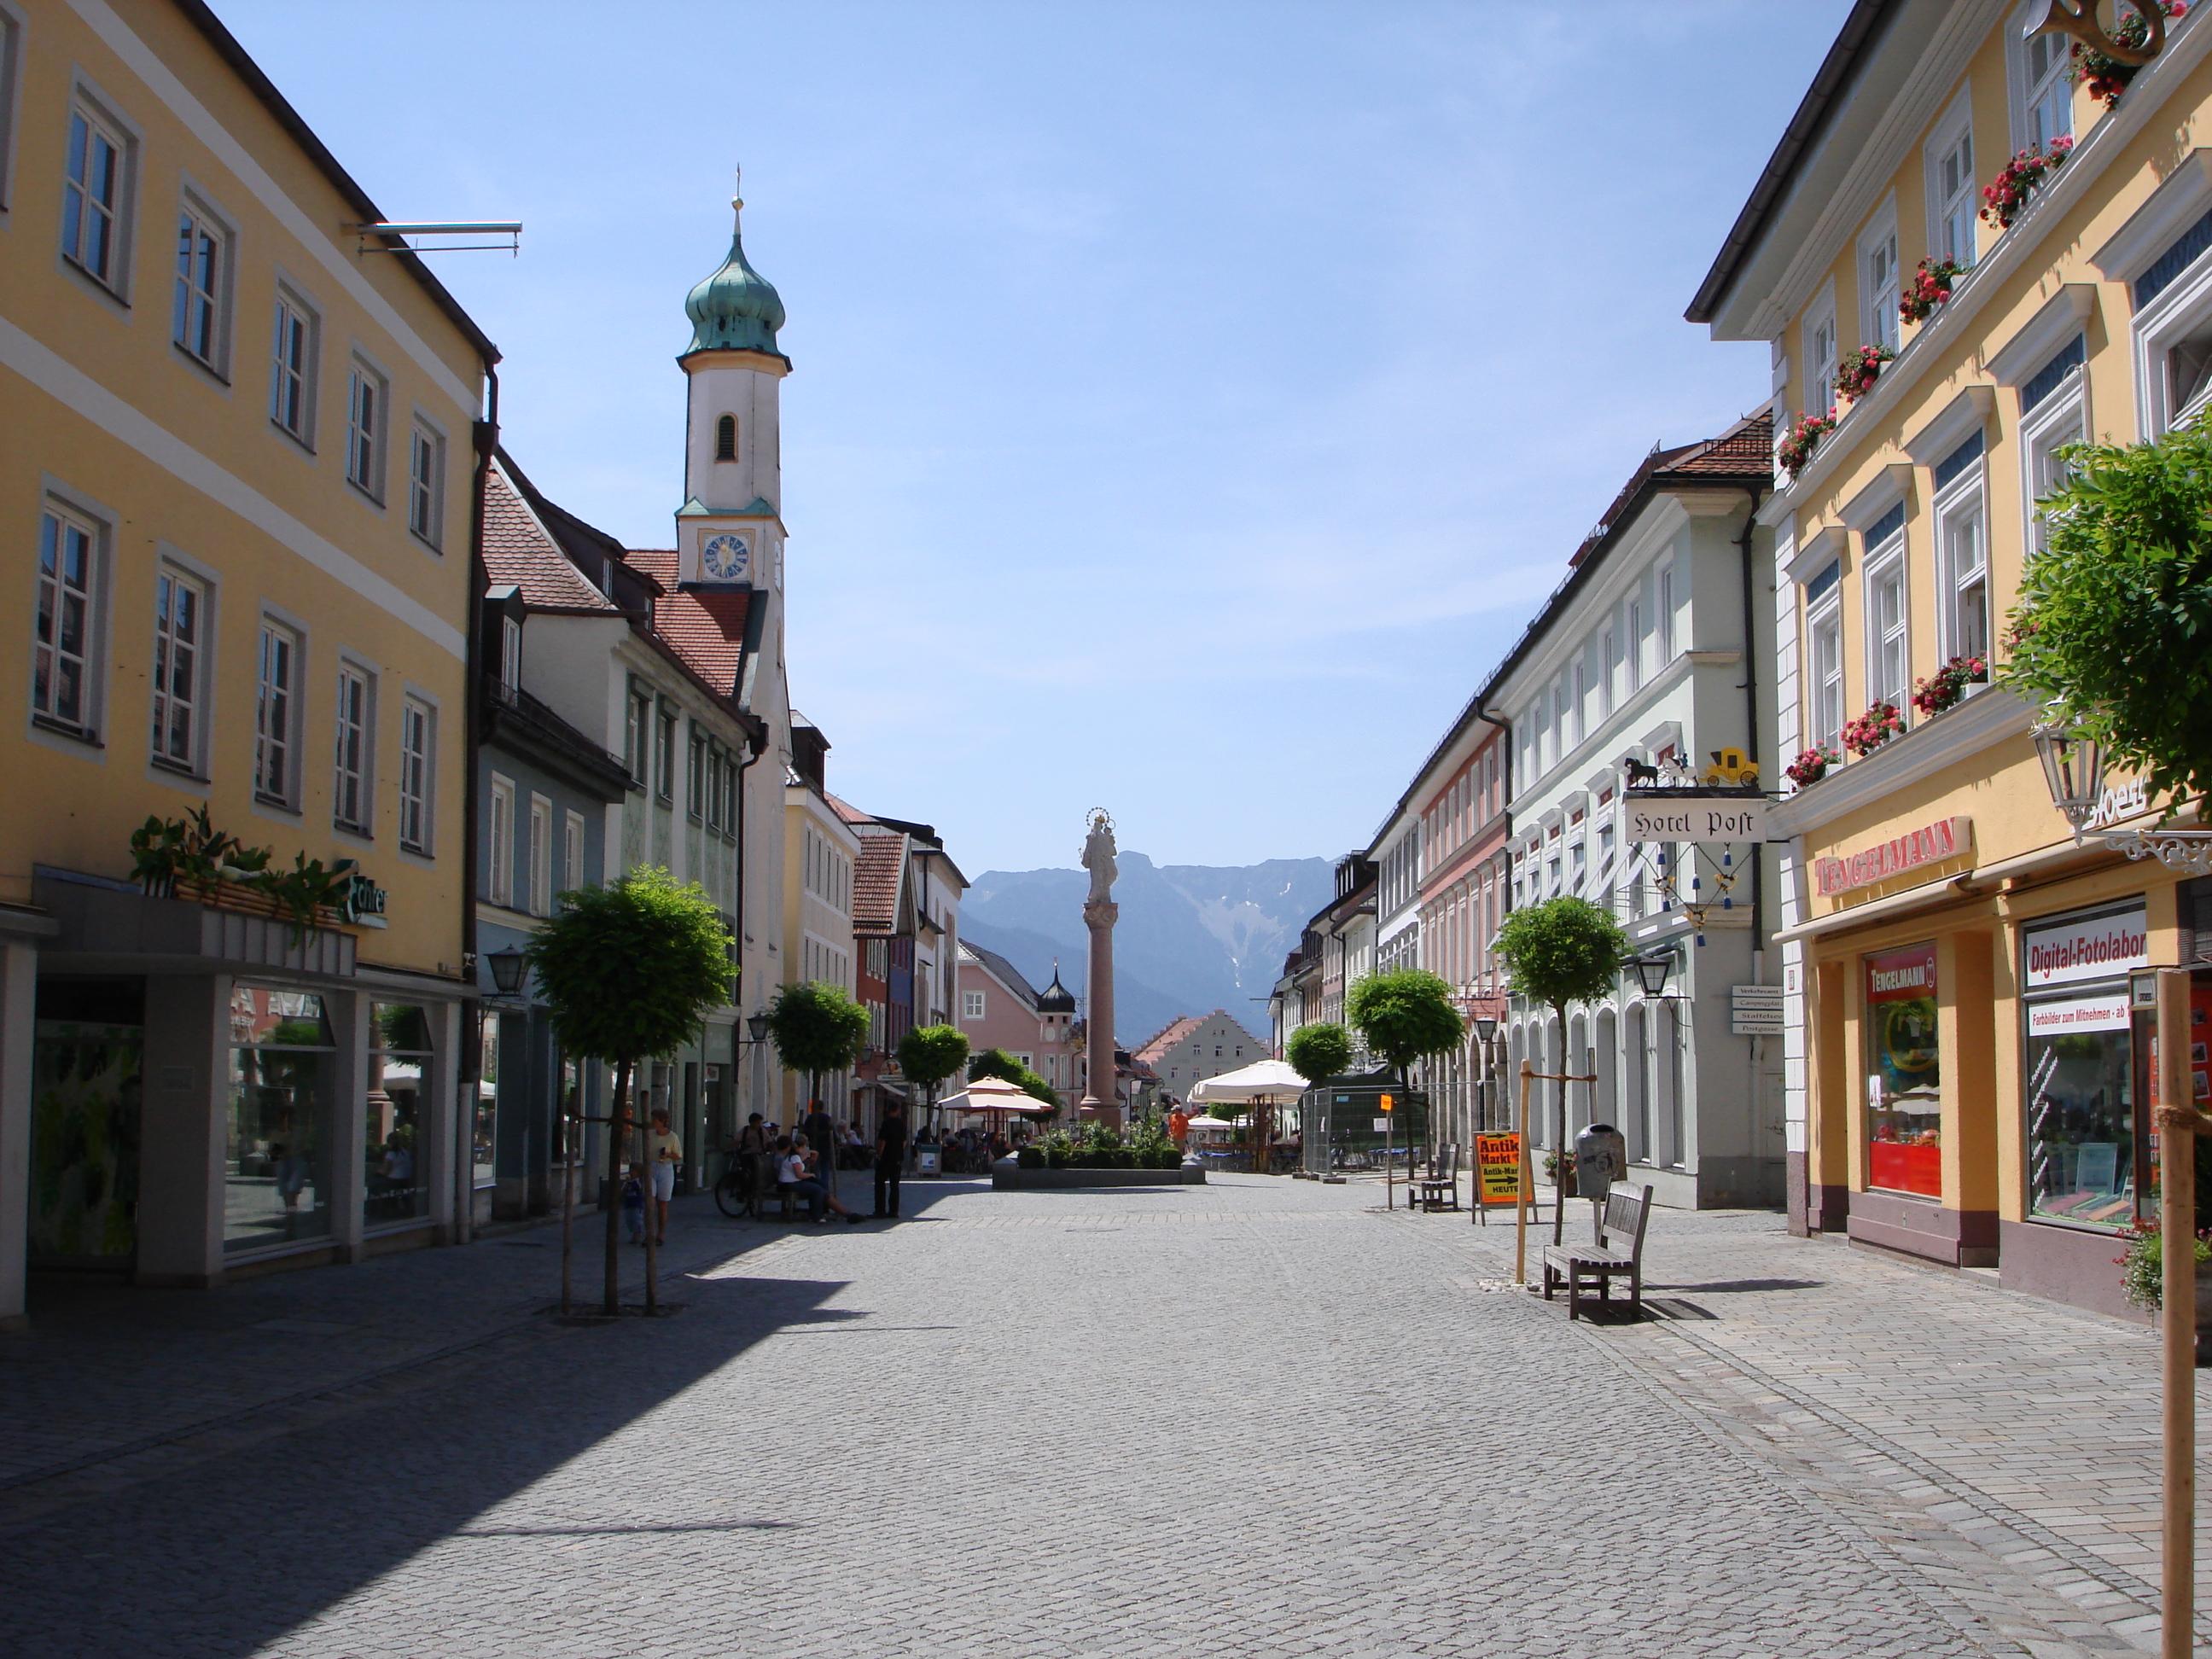 Murnau am Staffelsee Germany  city images : Original file  2,592 × 1,944 pixels, file size: 2.25 MB, MIME ...